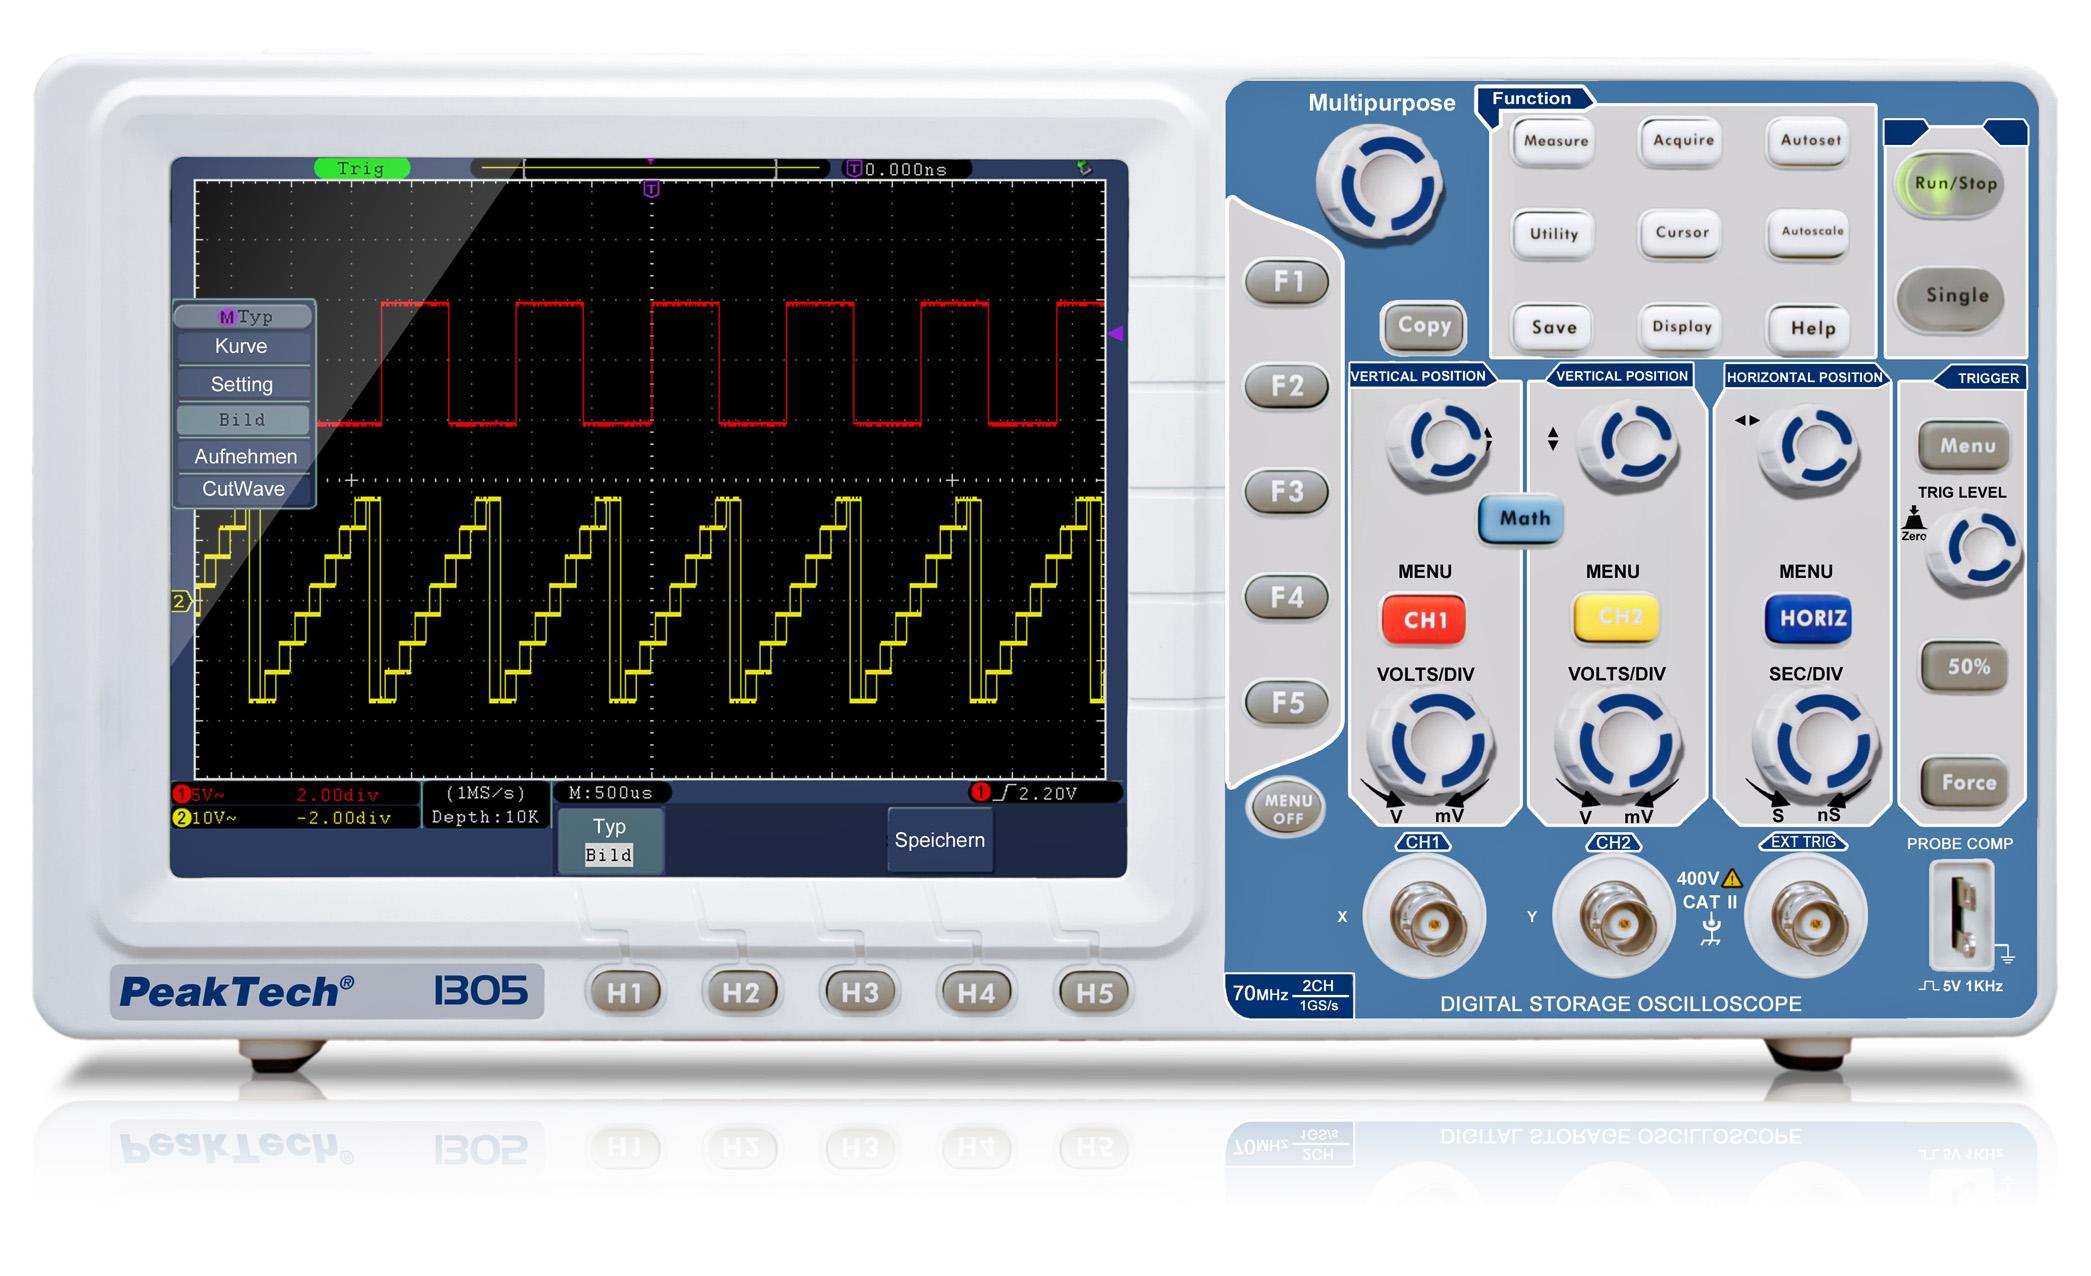 «PeakTech® P 1305» 70 MHz / 2 CH, 1 GS/s digital storage oscilloscope